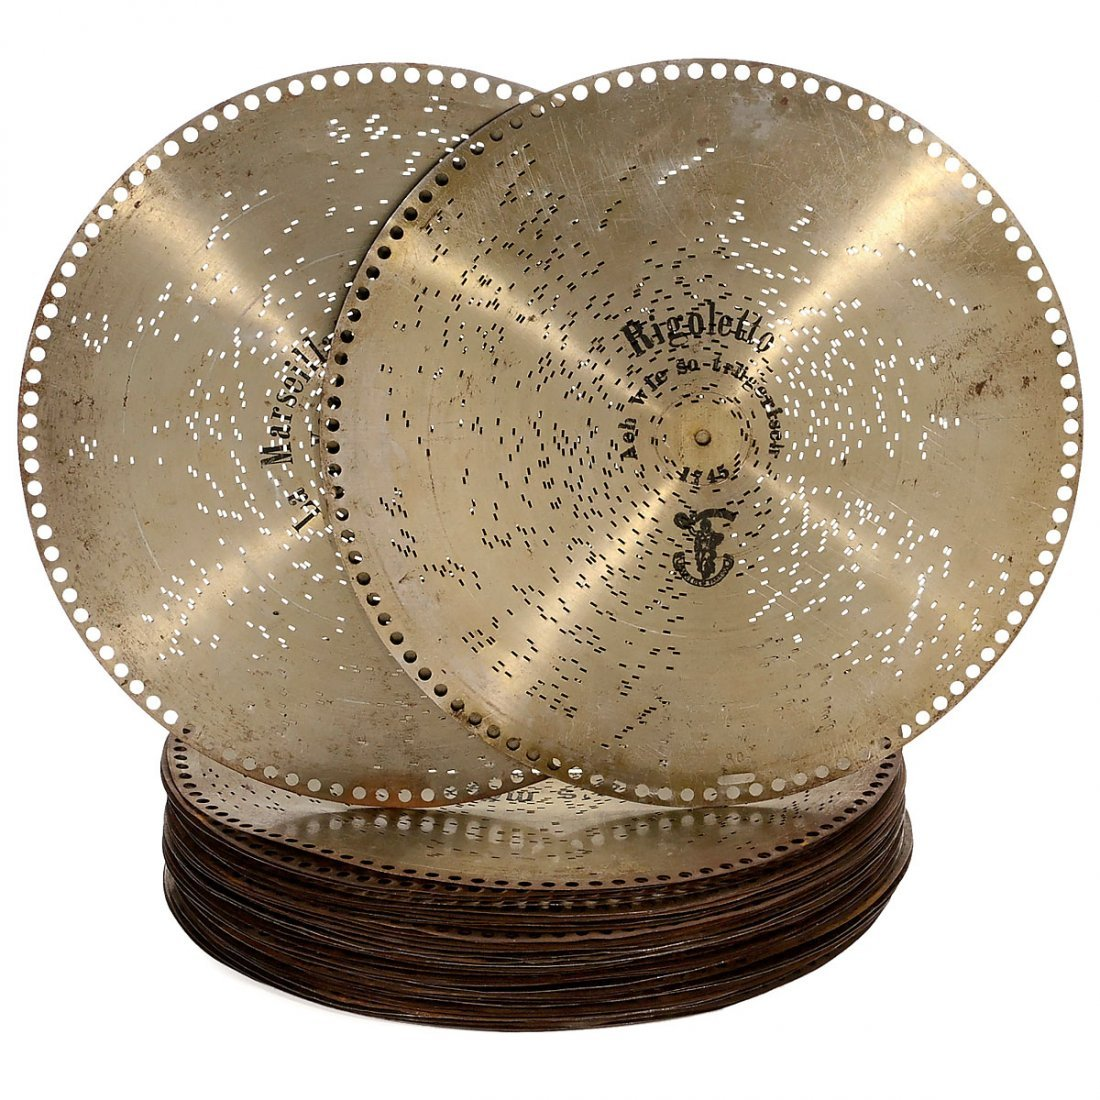 "37 ""Polyphon"" Ø 15¾ in. Discs"